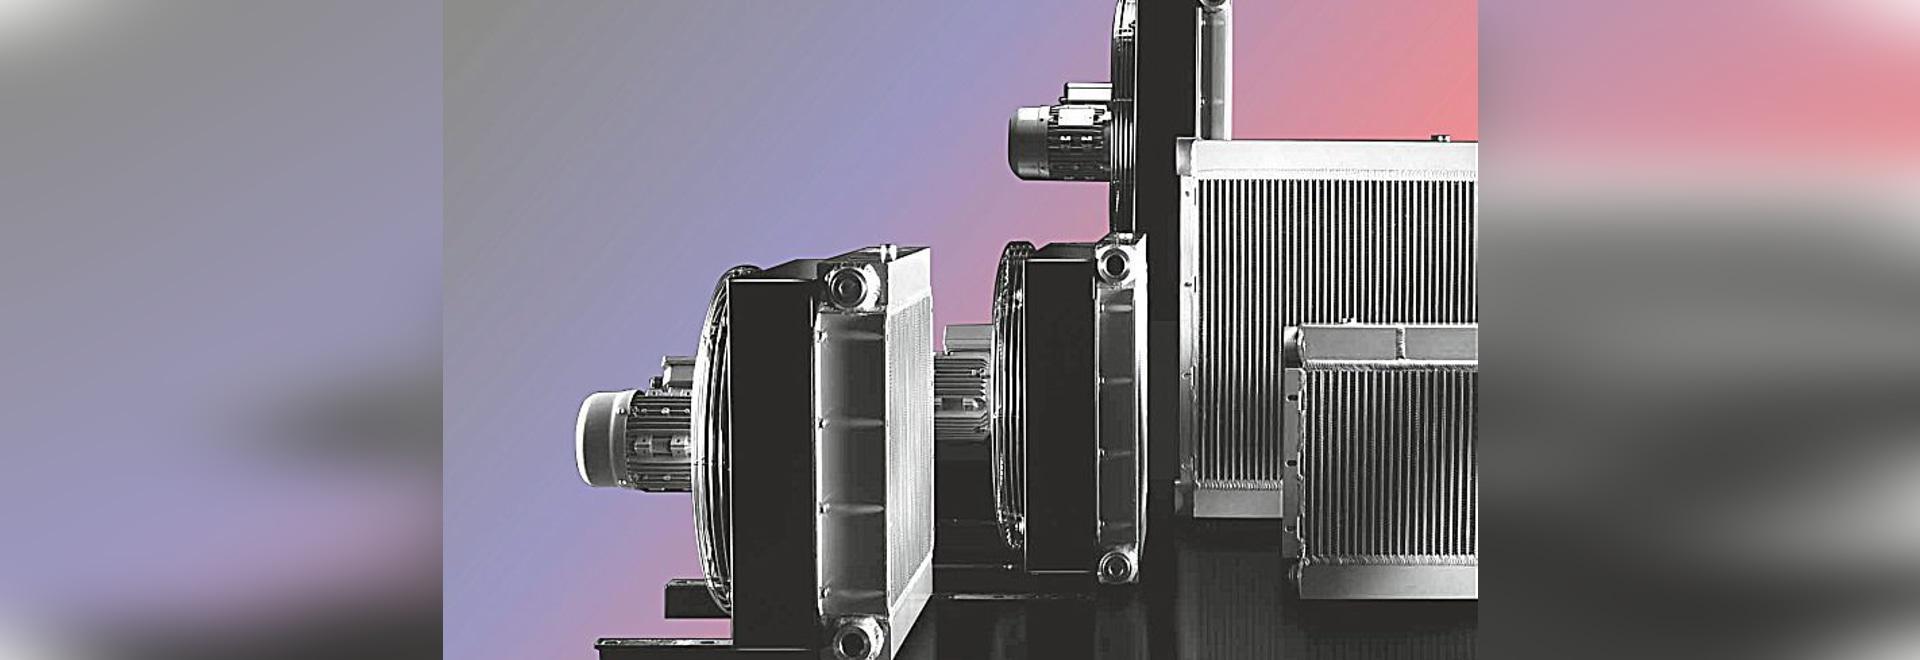 Öl-Luft-Kühlvorrichtungen